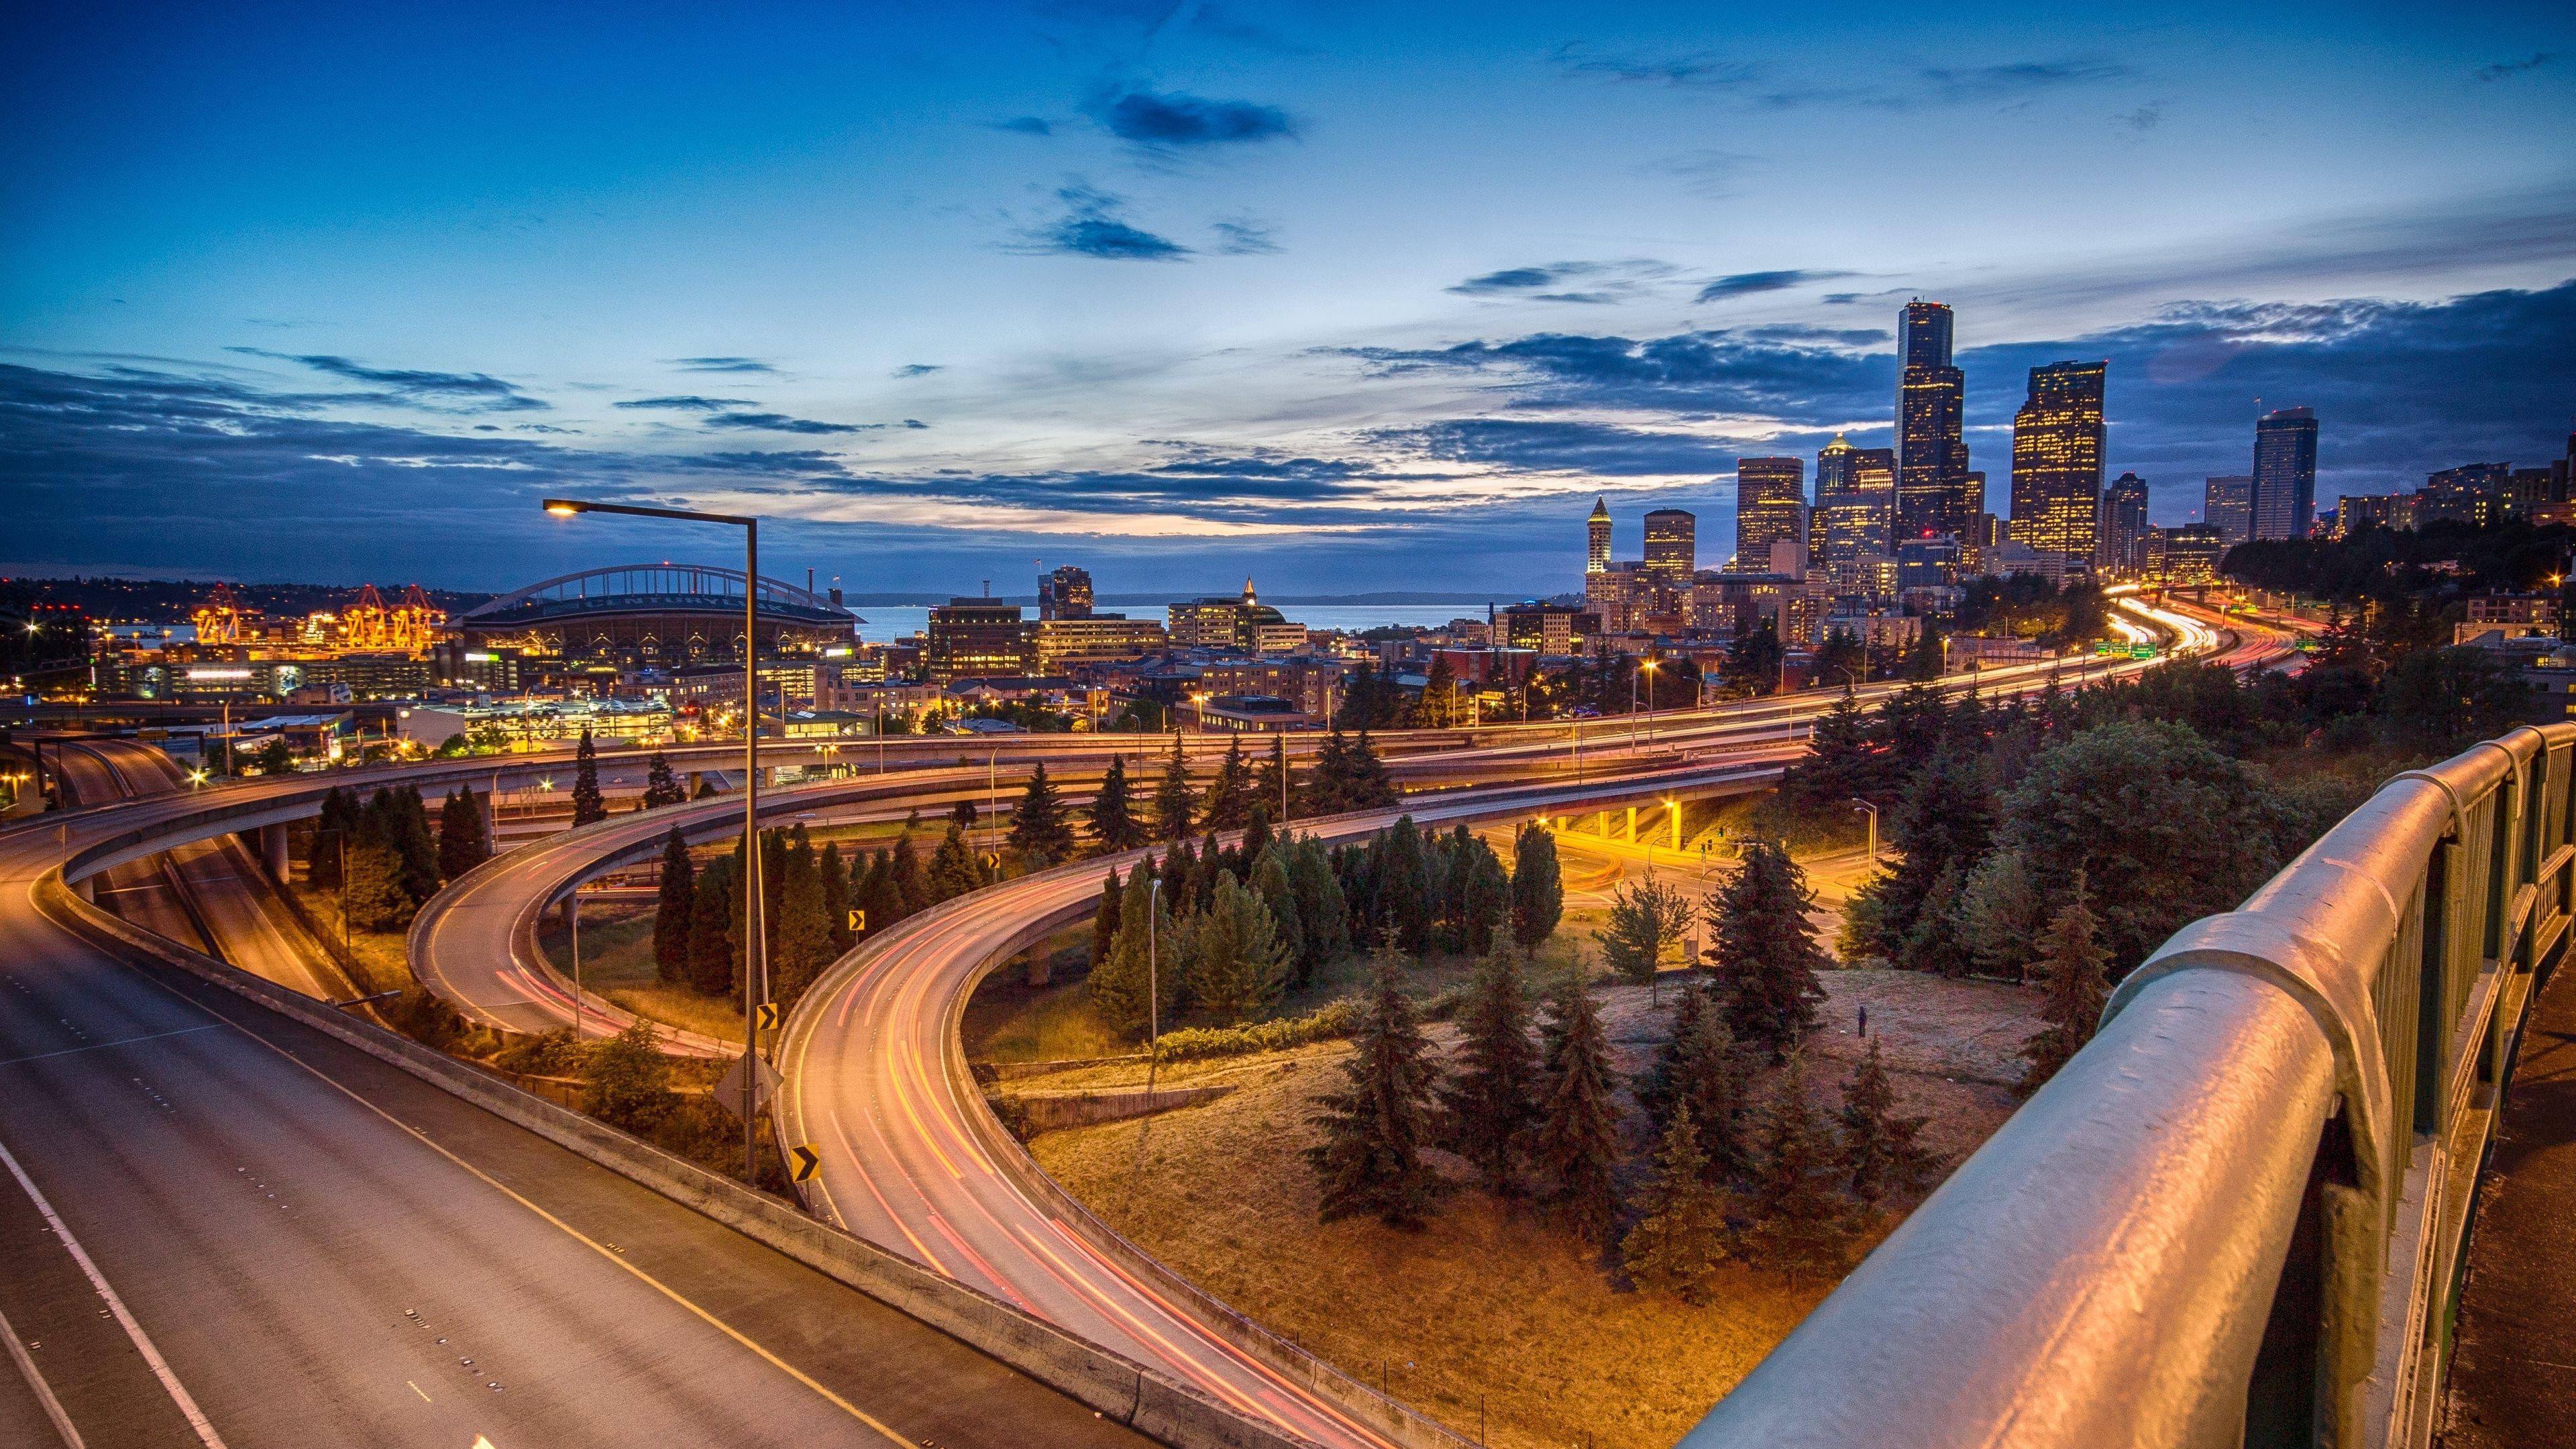 Heath Gordon Free Computer Wallpaper For Seattle 3840x2160 Px 4k Background Seattle Skyline Skyline